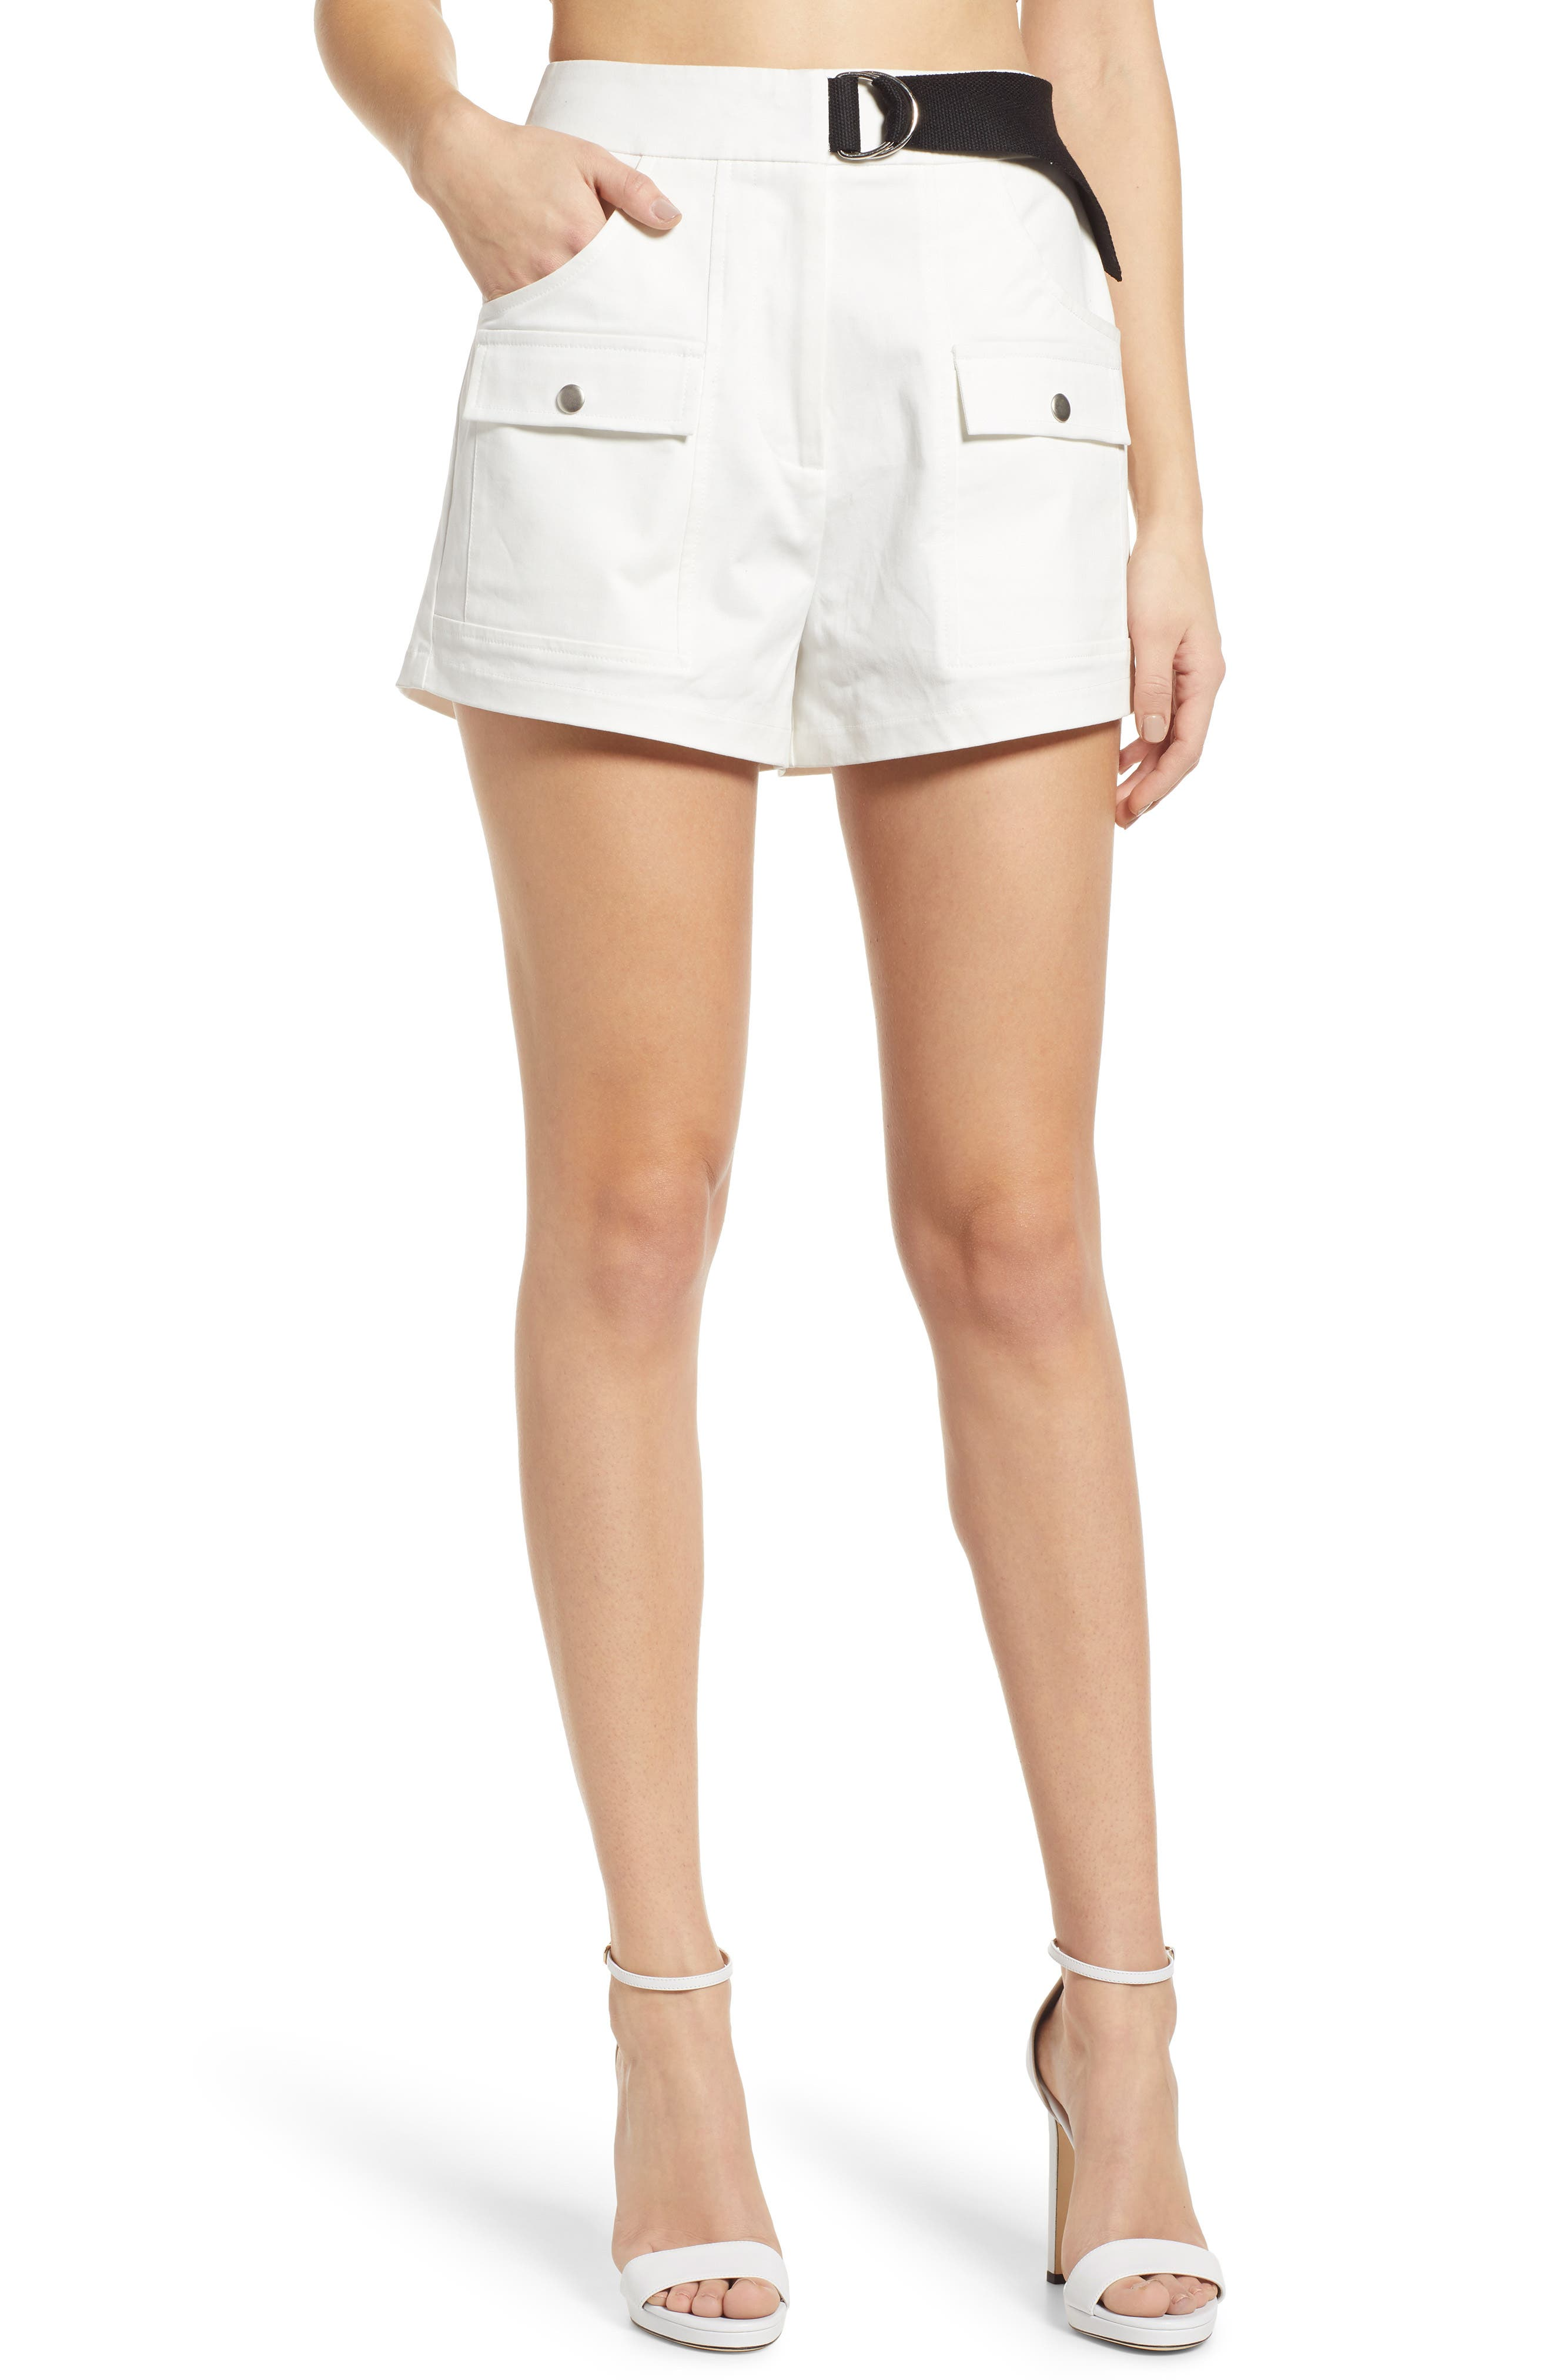 Tiger Mist Aliyah Cargo Shorts, White